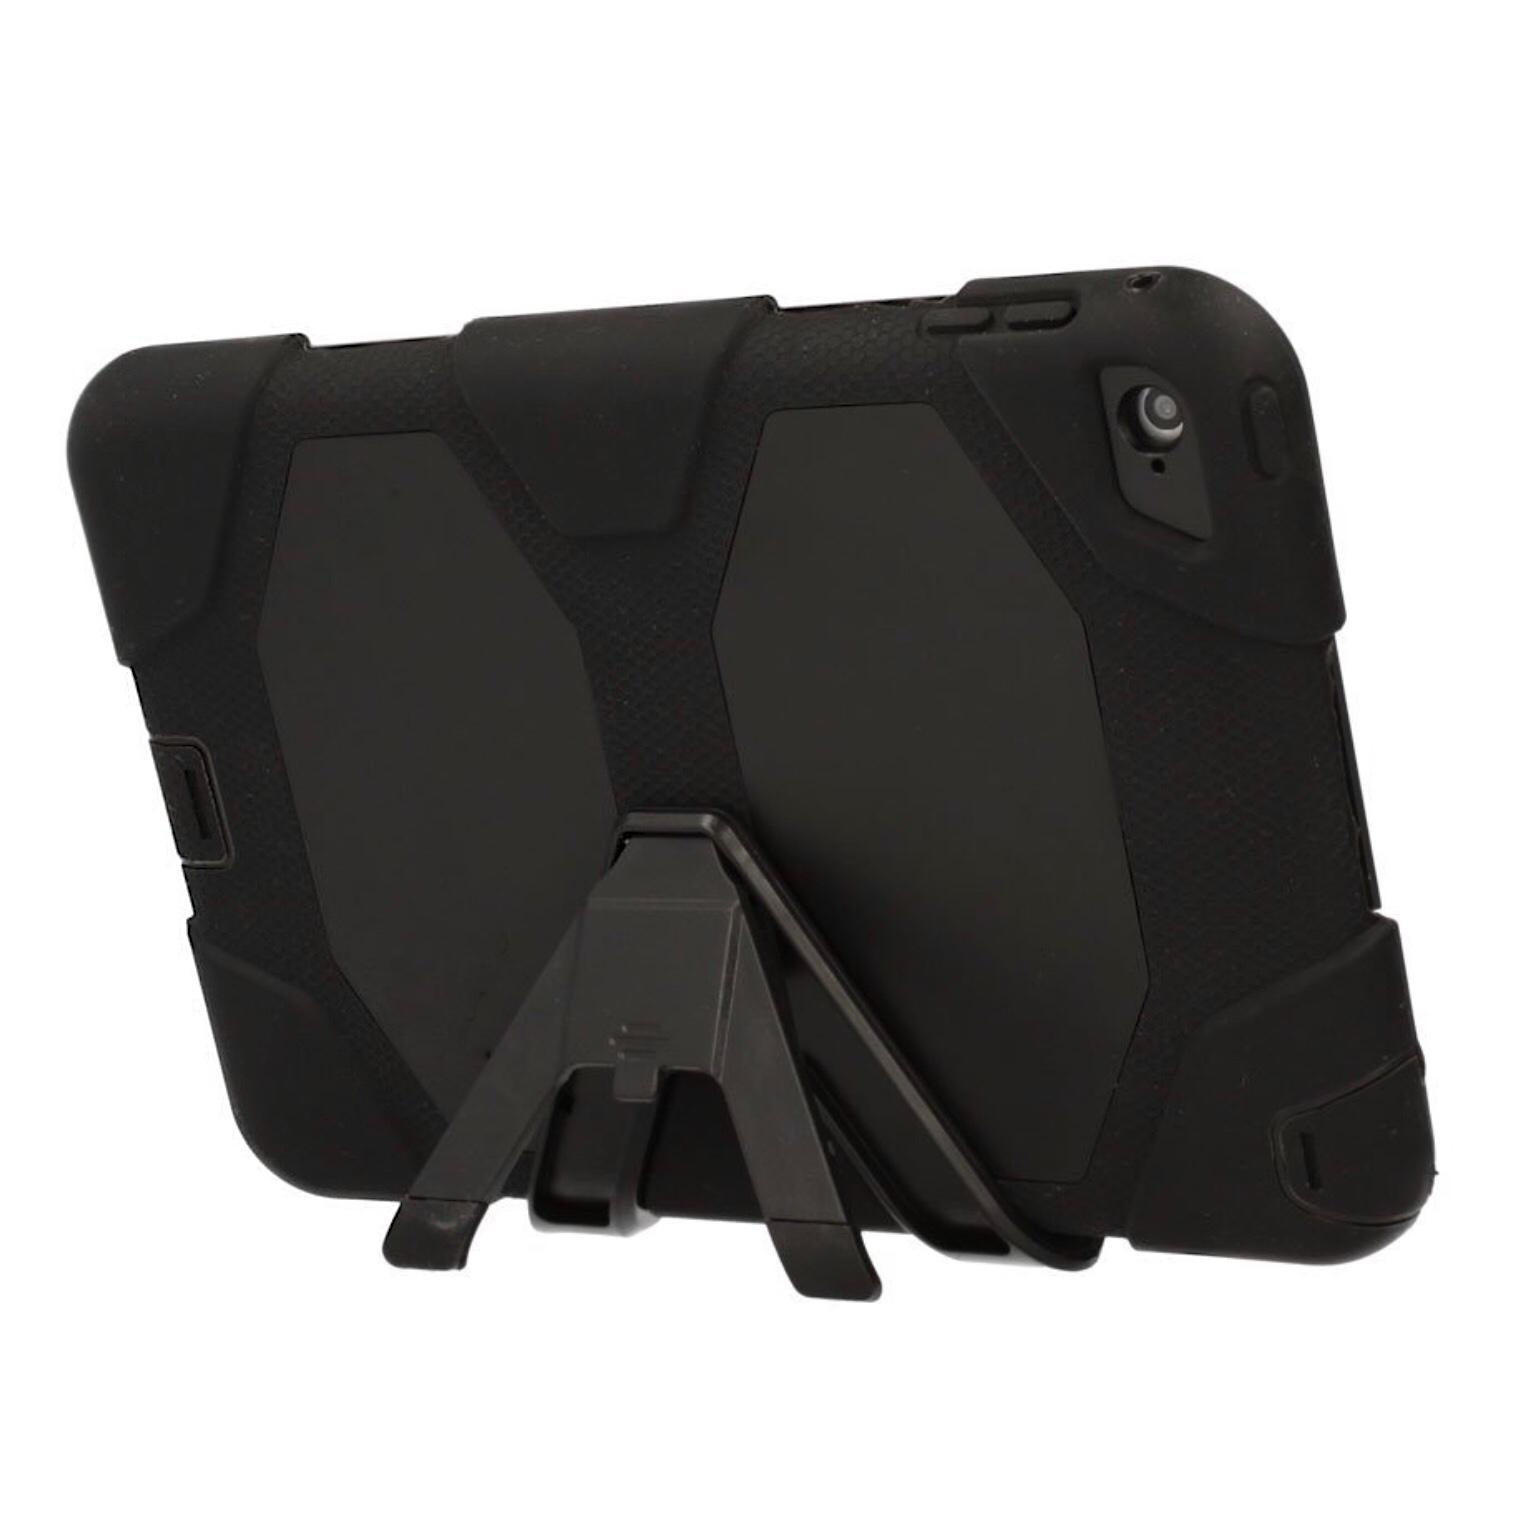 iPad Mini 4 Coque renforcee Vegas avec film rigide de protection ecran